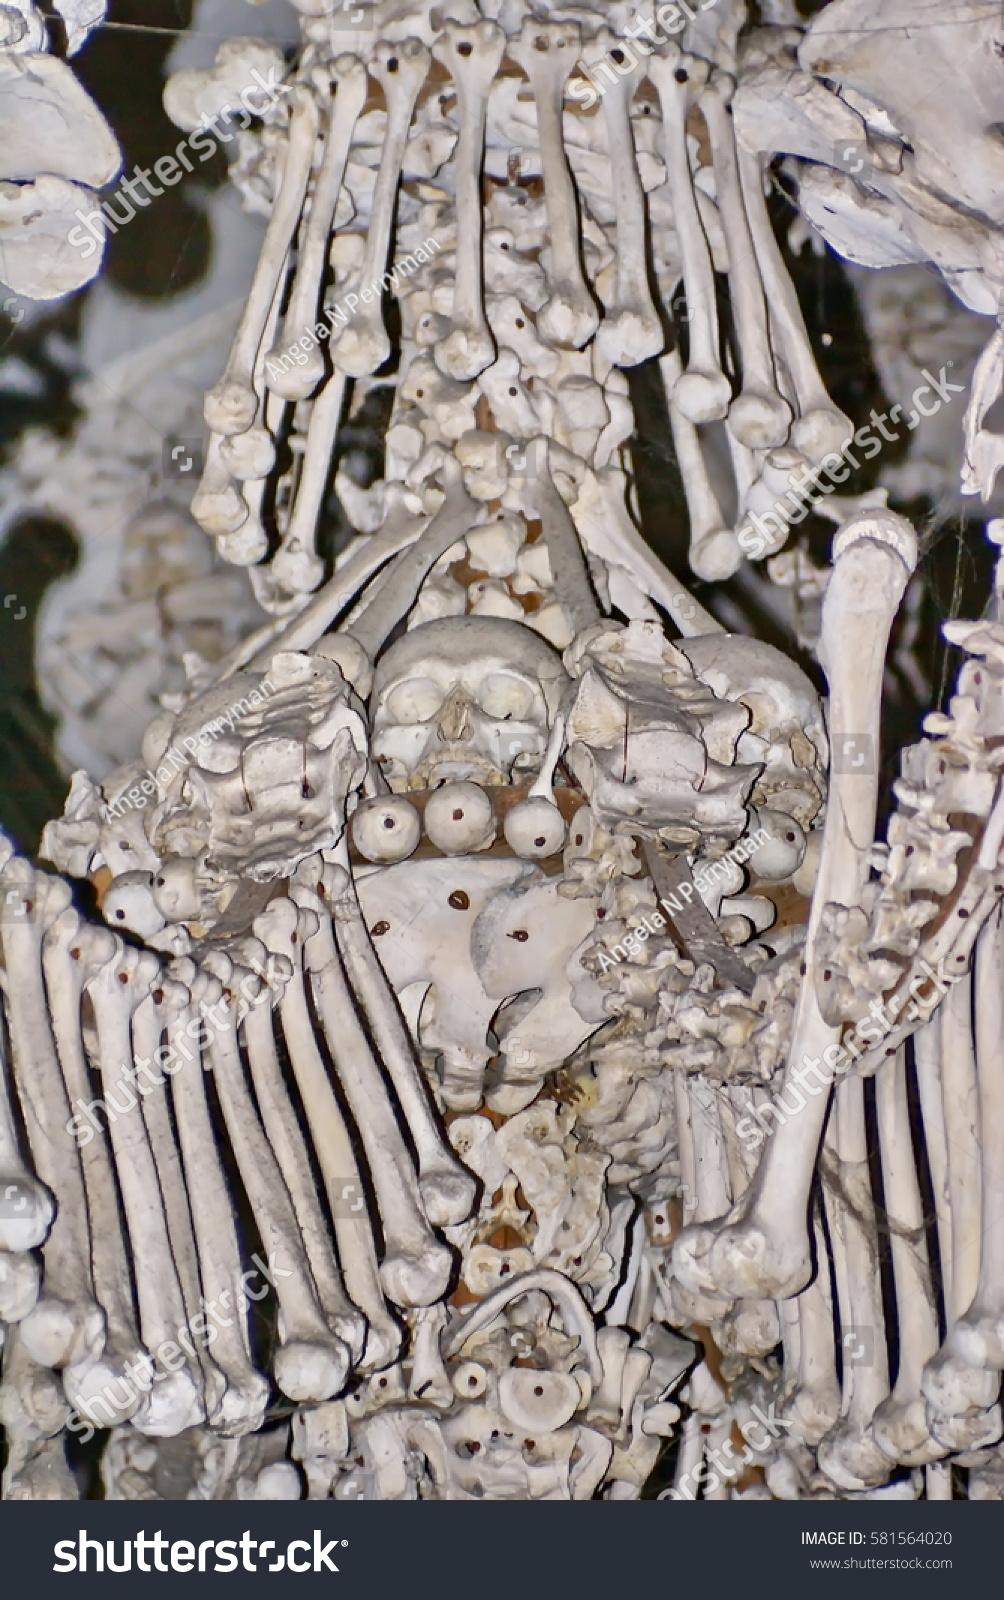 Kutna Hora Czech Republic October 10 2010 Chandelier Made From Human Bones